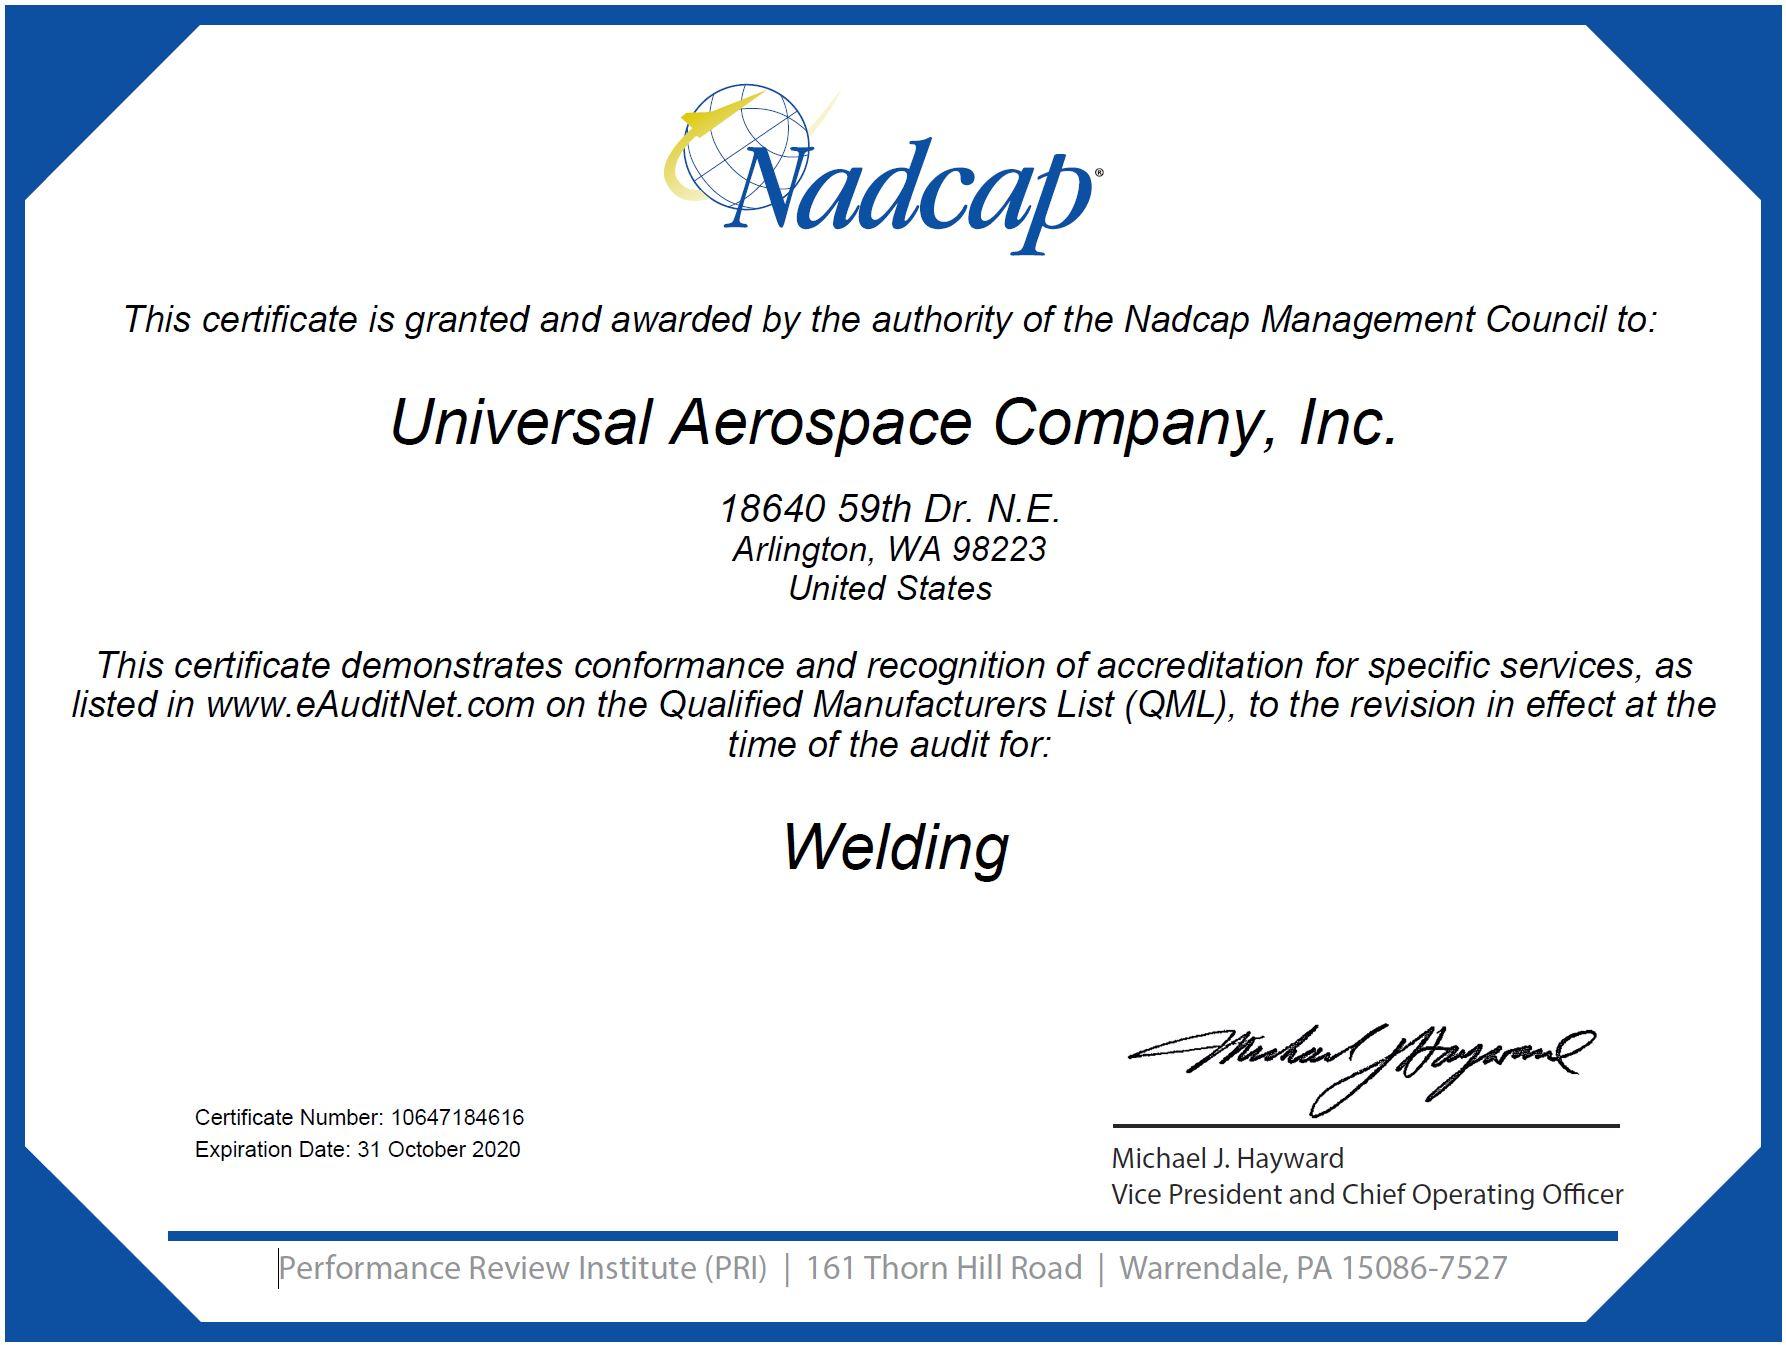 UAC NADCAP Welding Cert Oct 2020